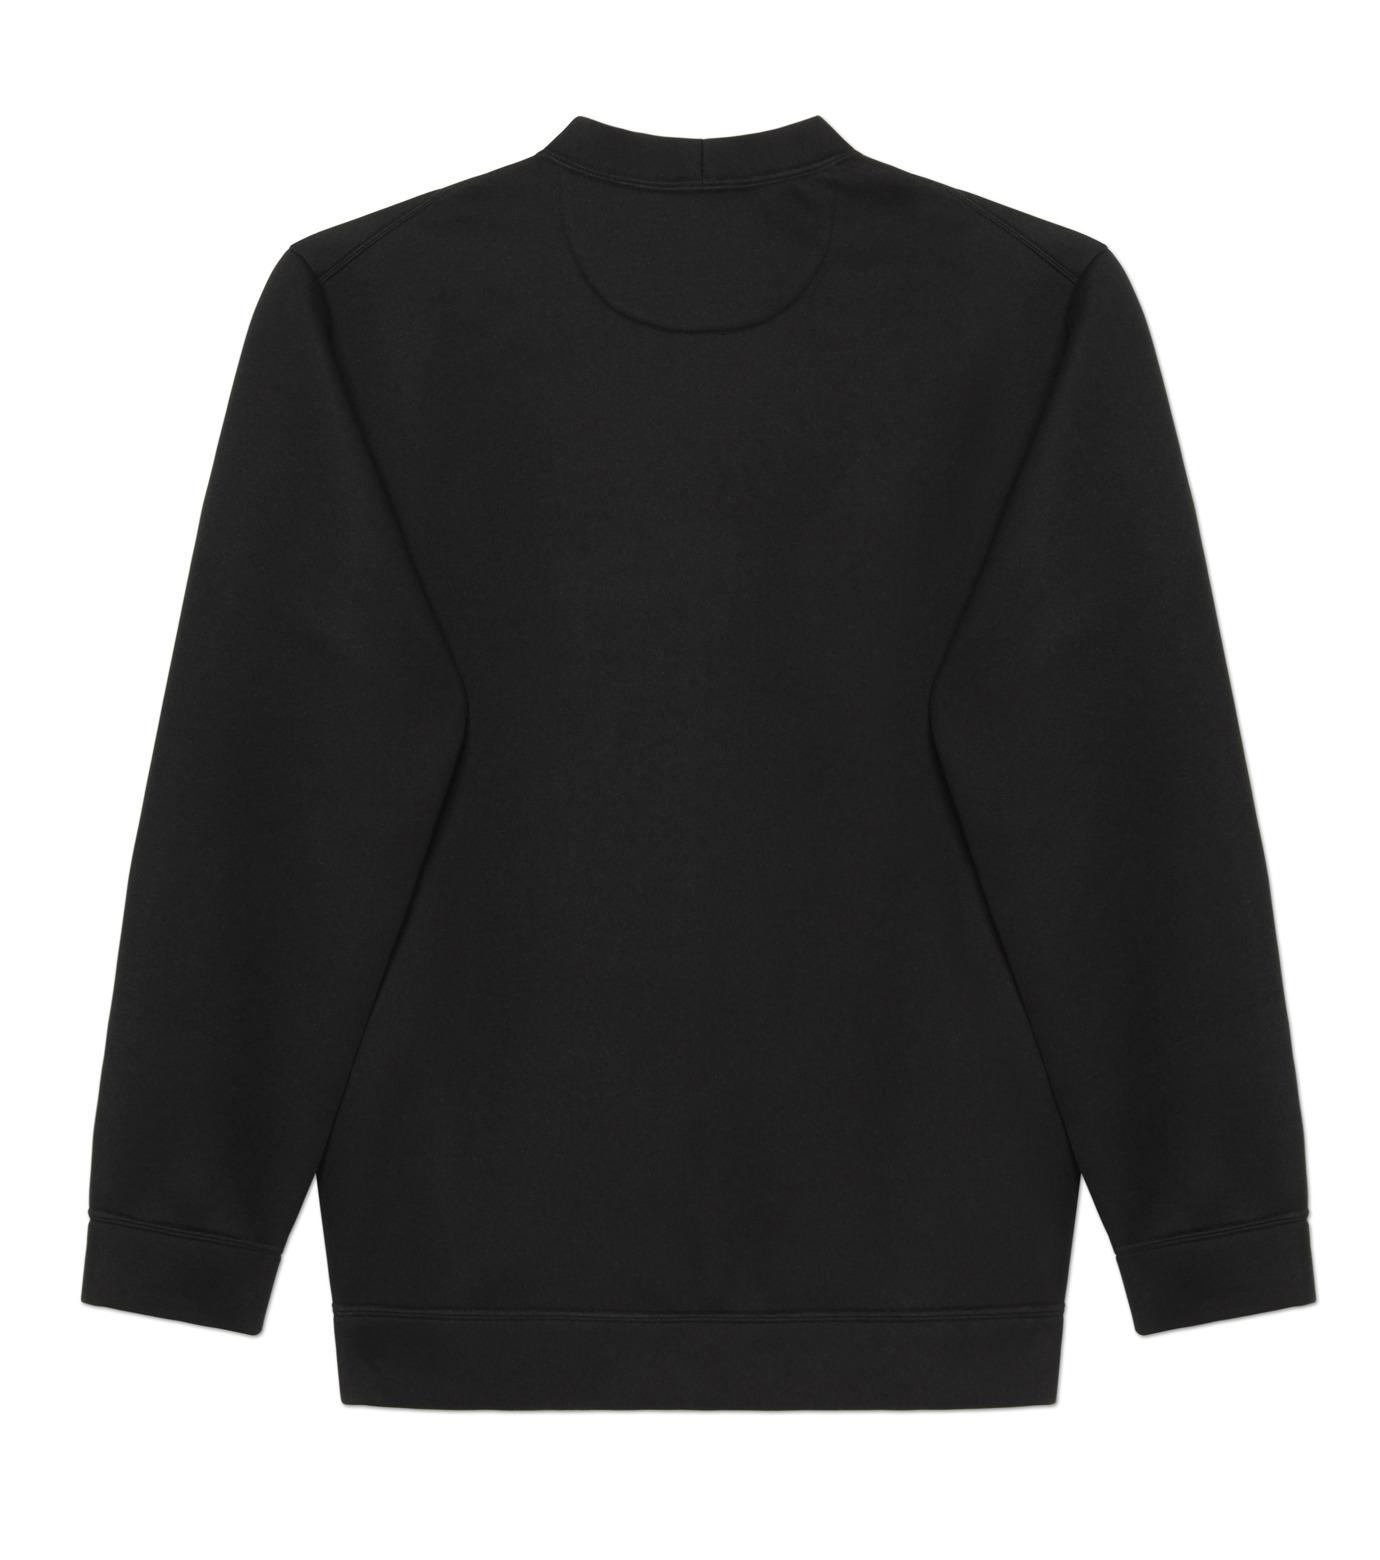 HL HEDDIE LOVU(エイチエル・エディールーヴ)のBONDING SWEATSHIRT-BLACK(カットソー/cut and sewn)-18S92001-13 拡大詳細画像5